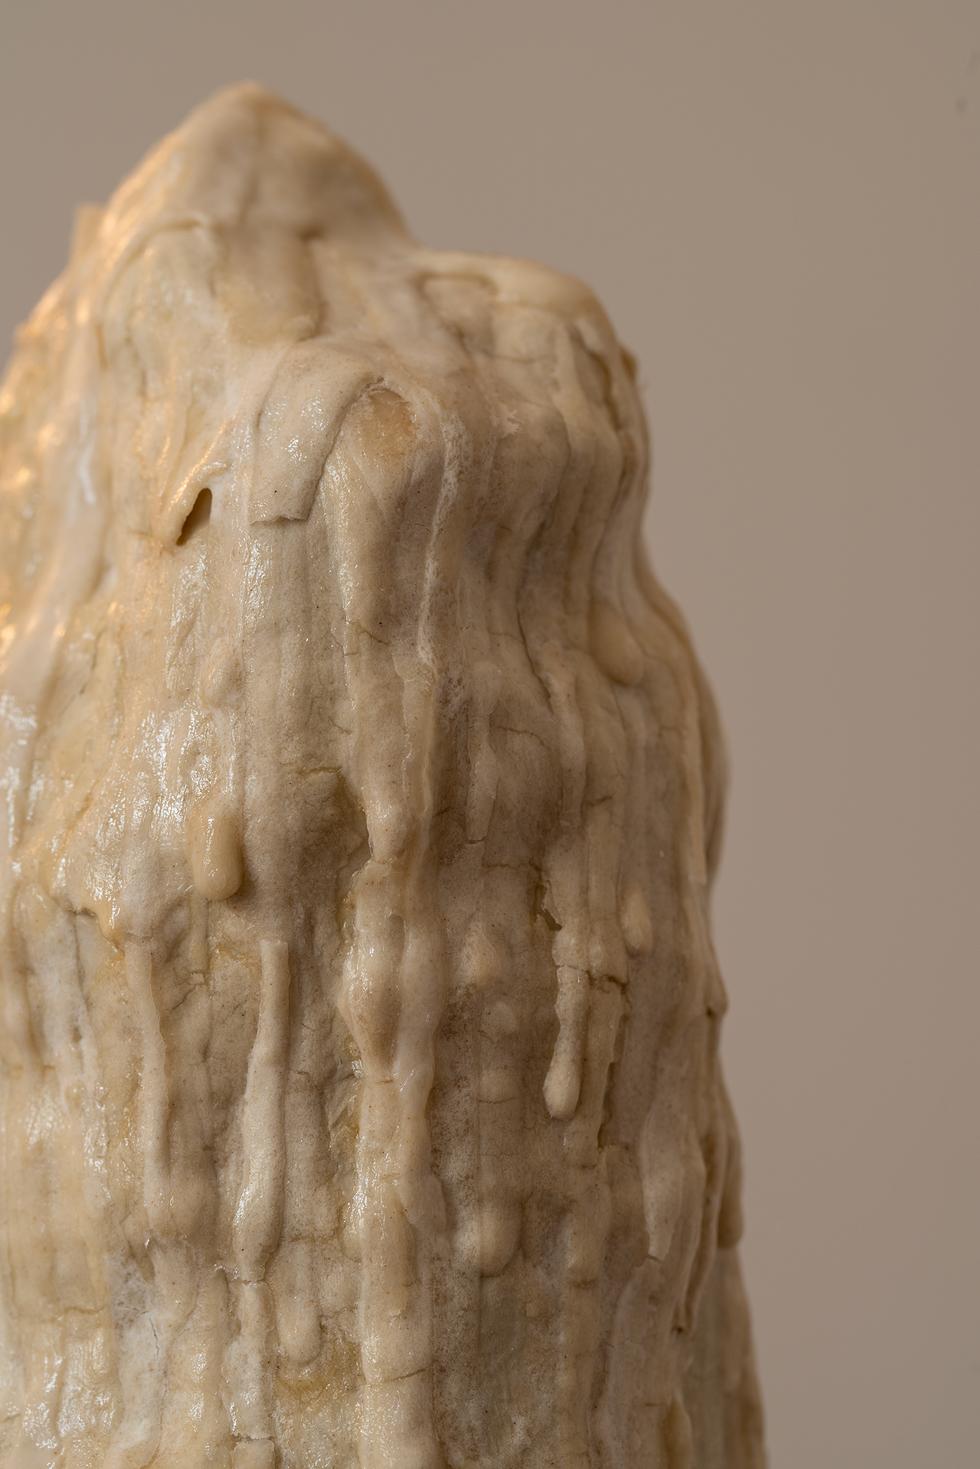 Stalagmite Detail